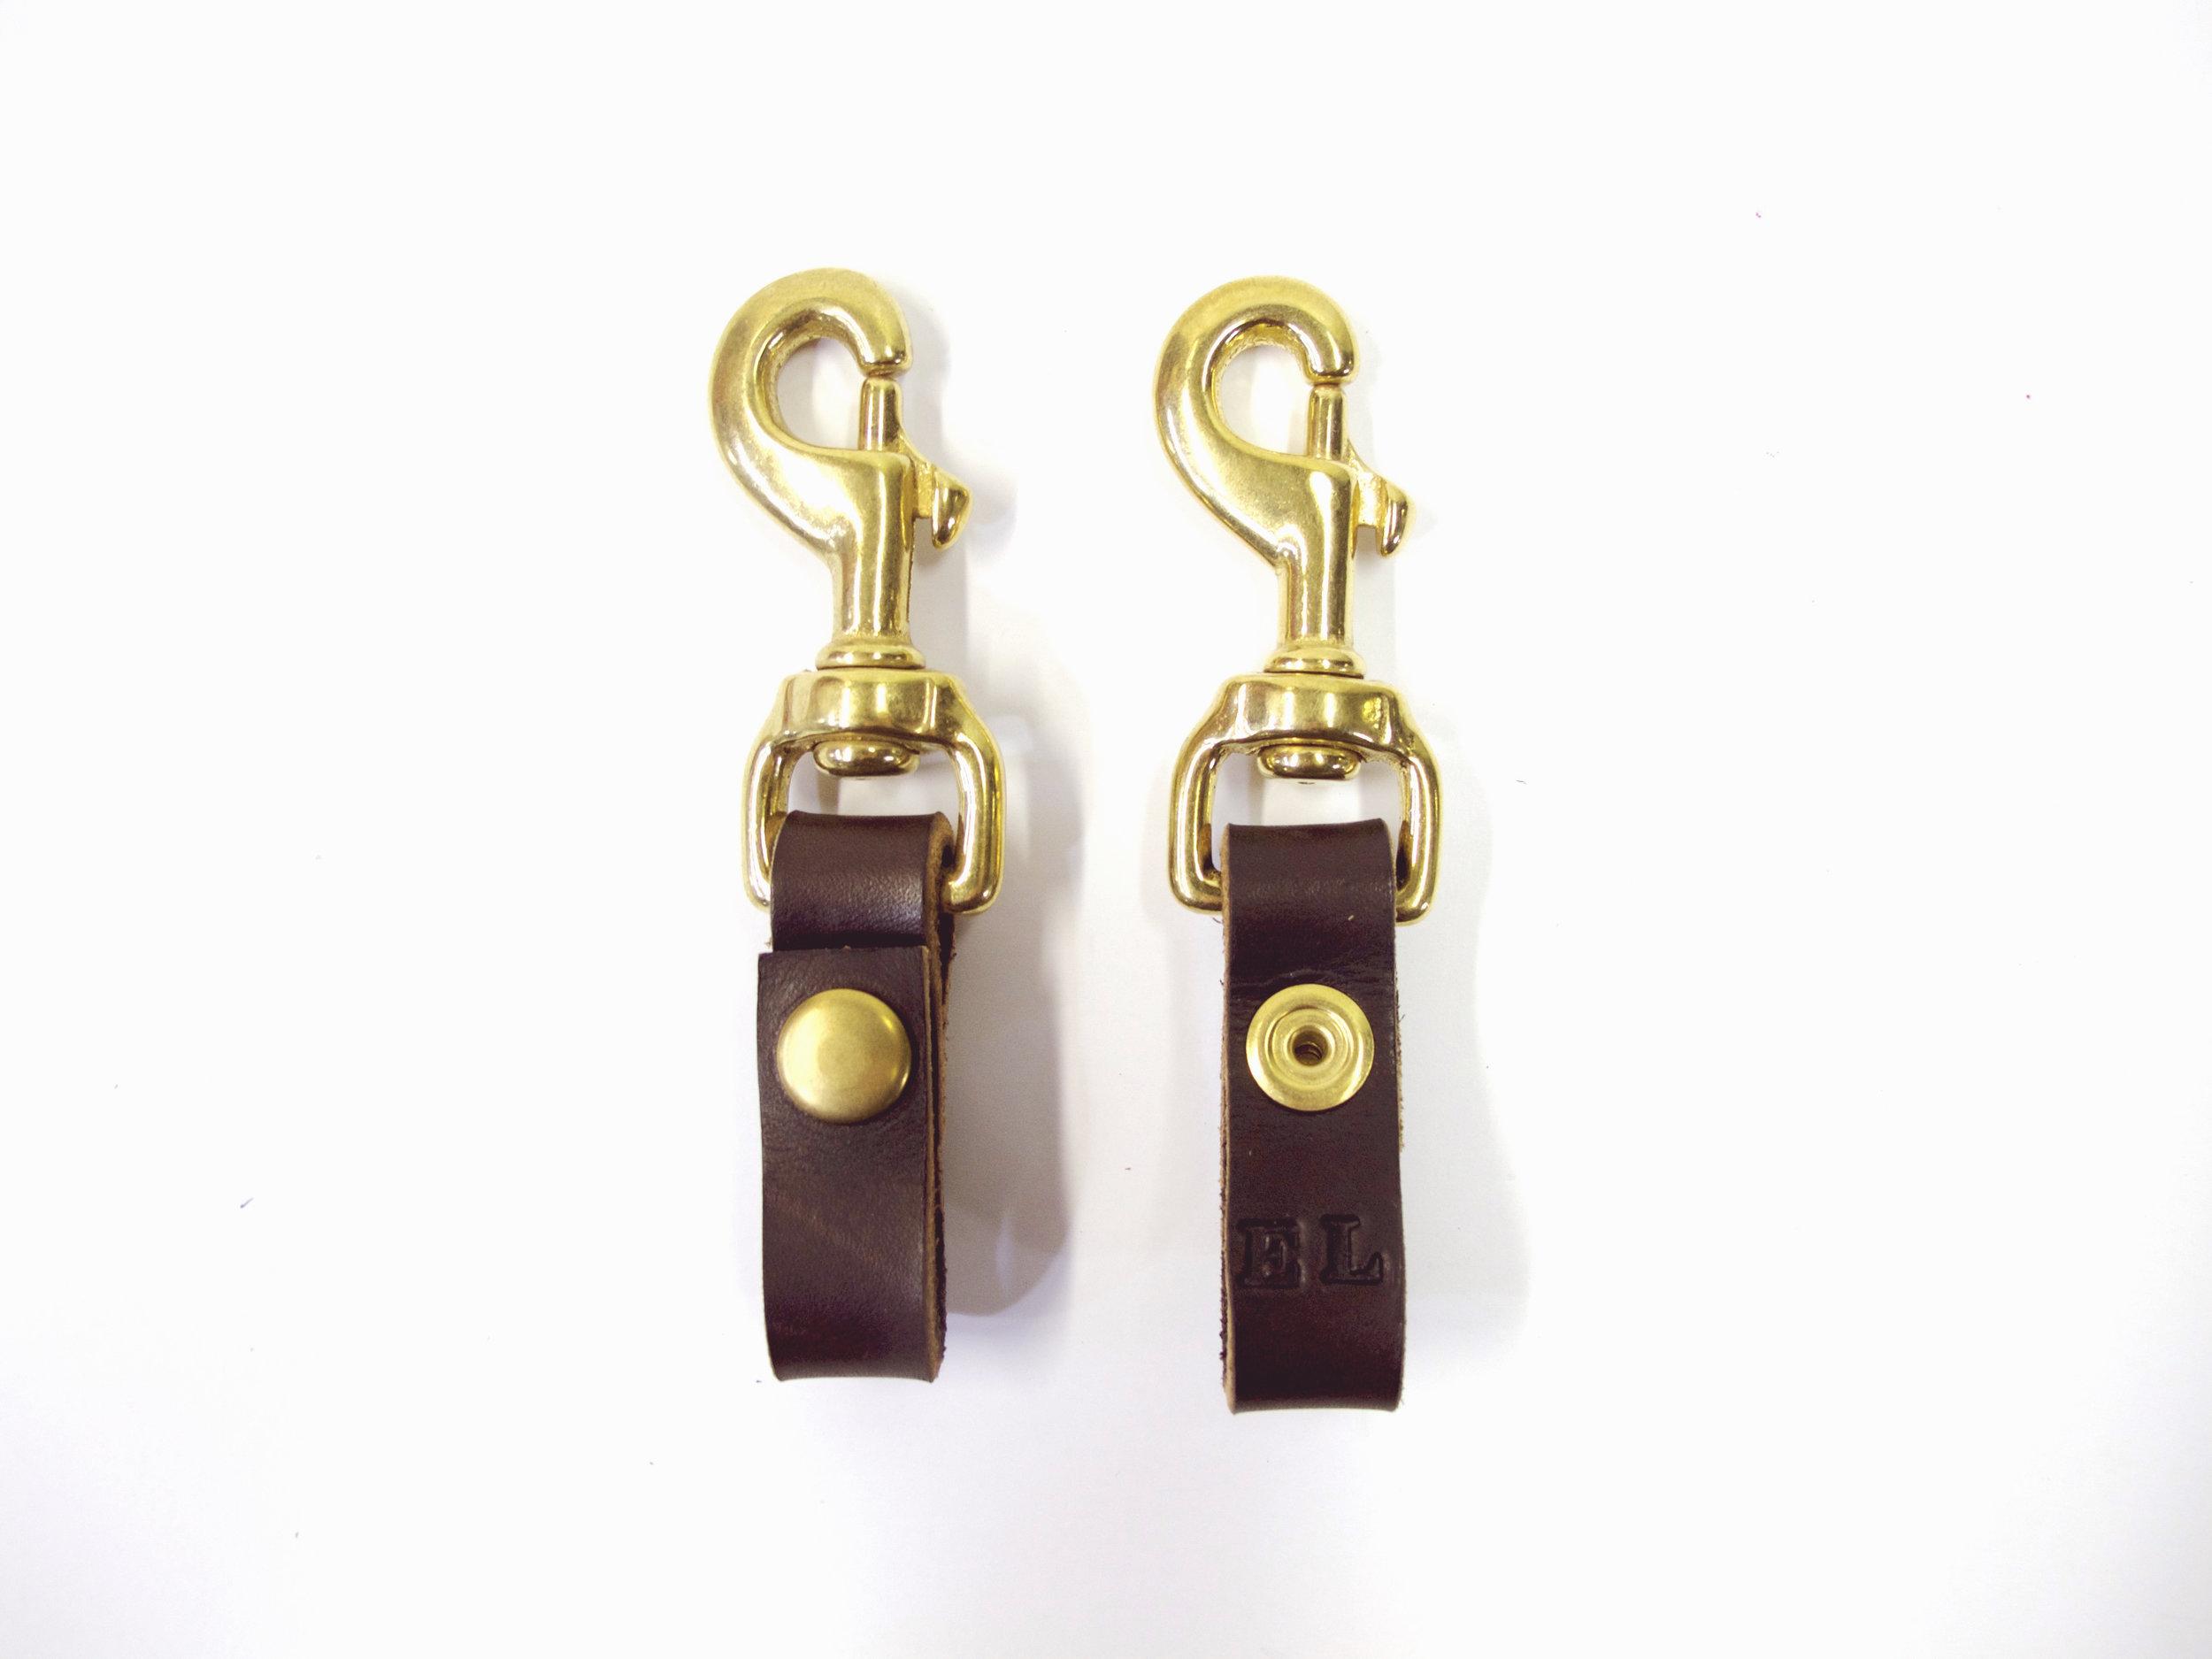 brown leather key holder.jpeg